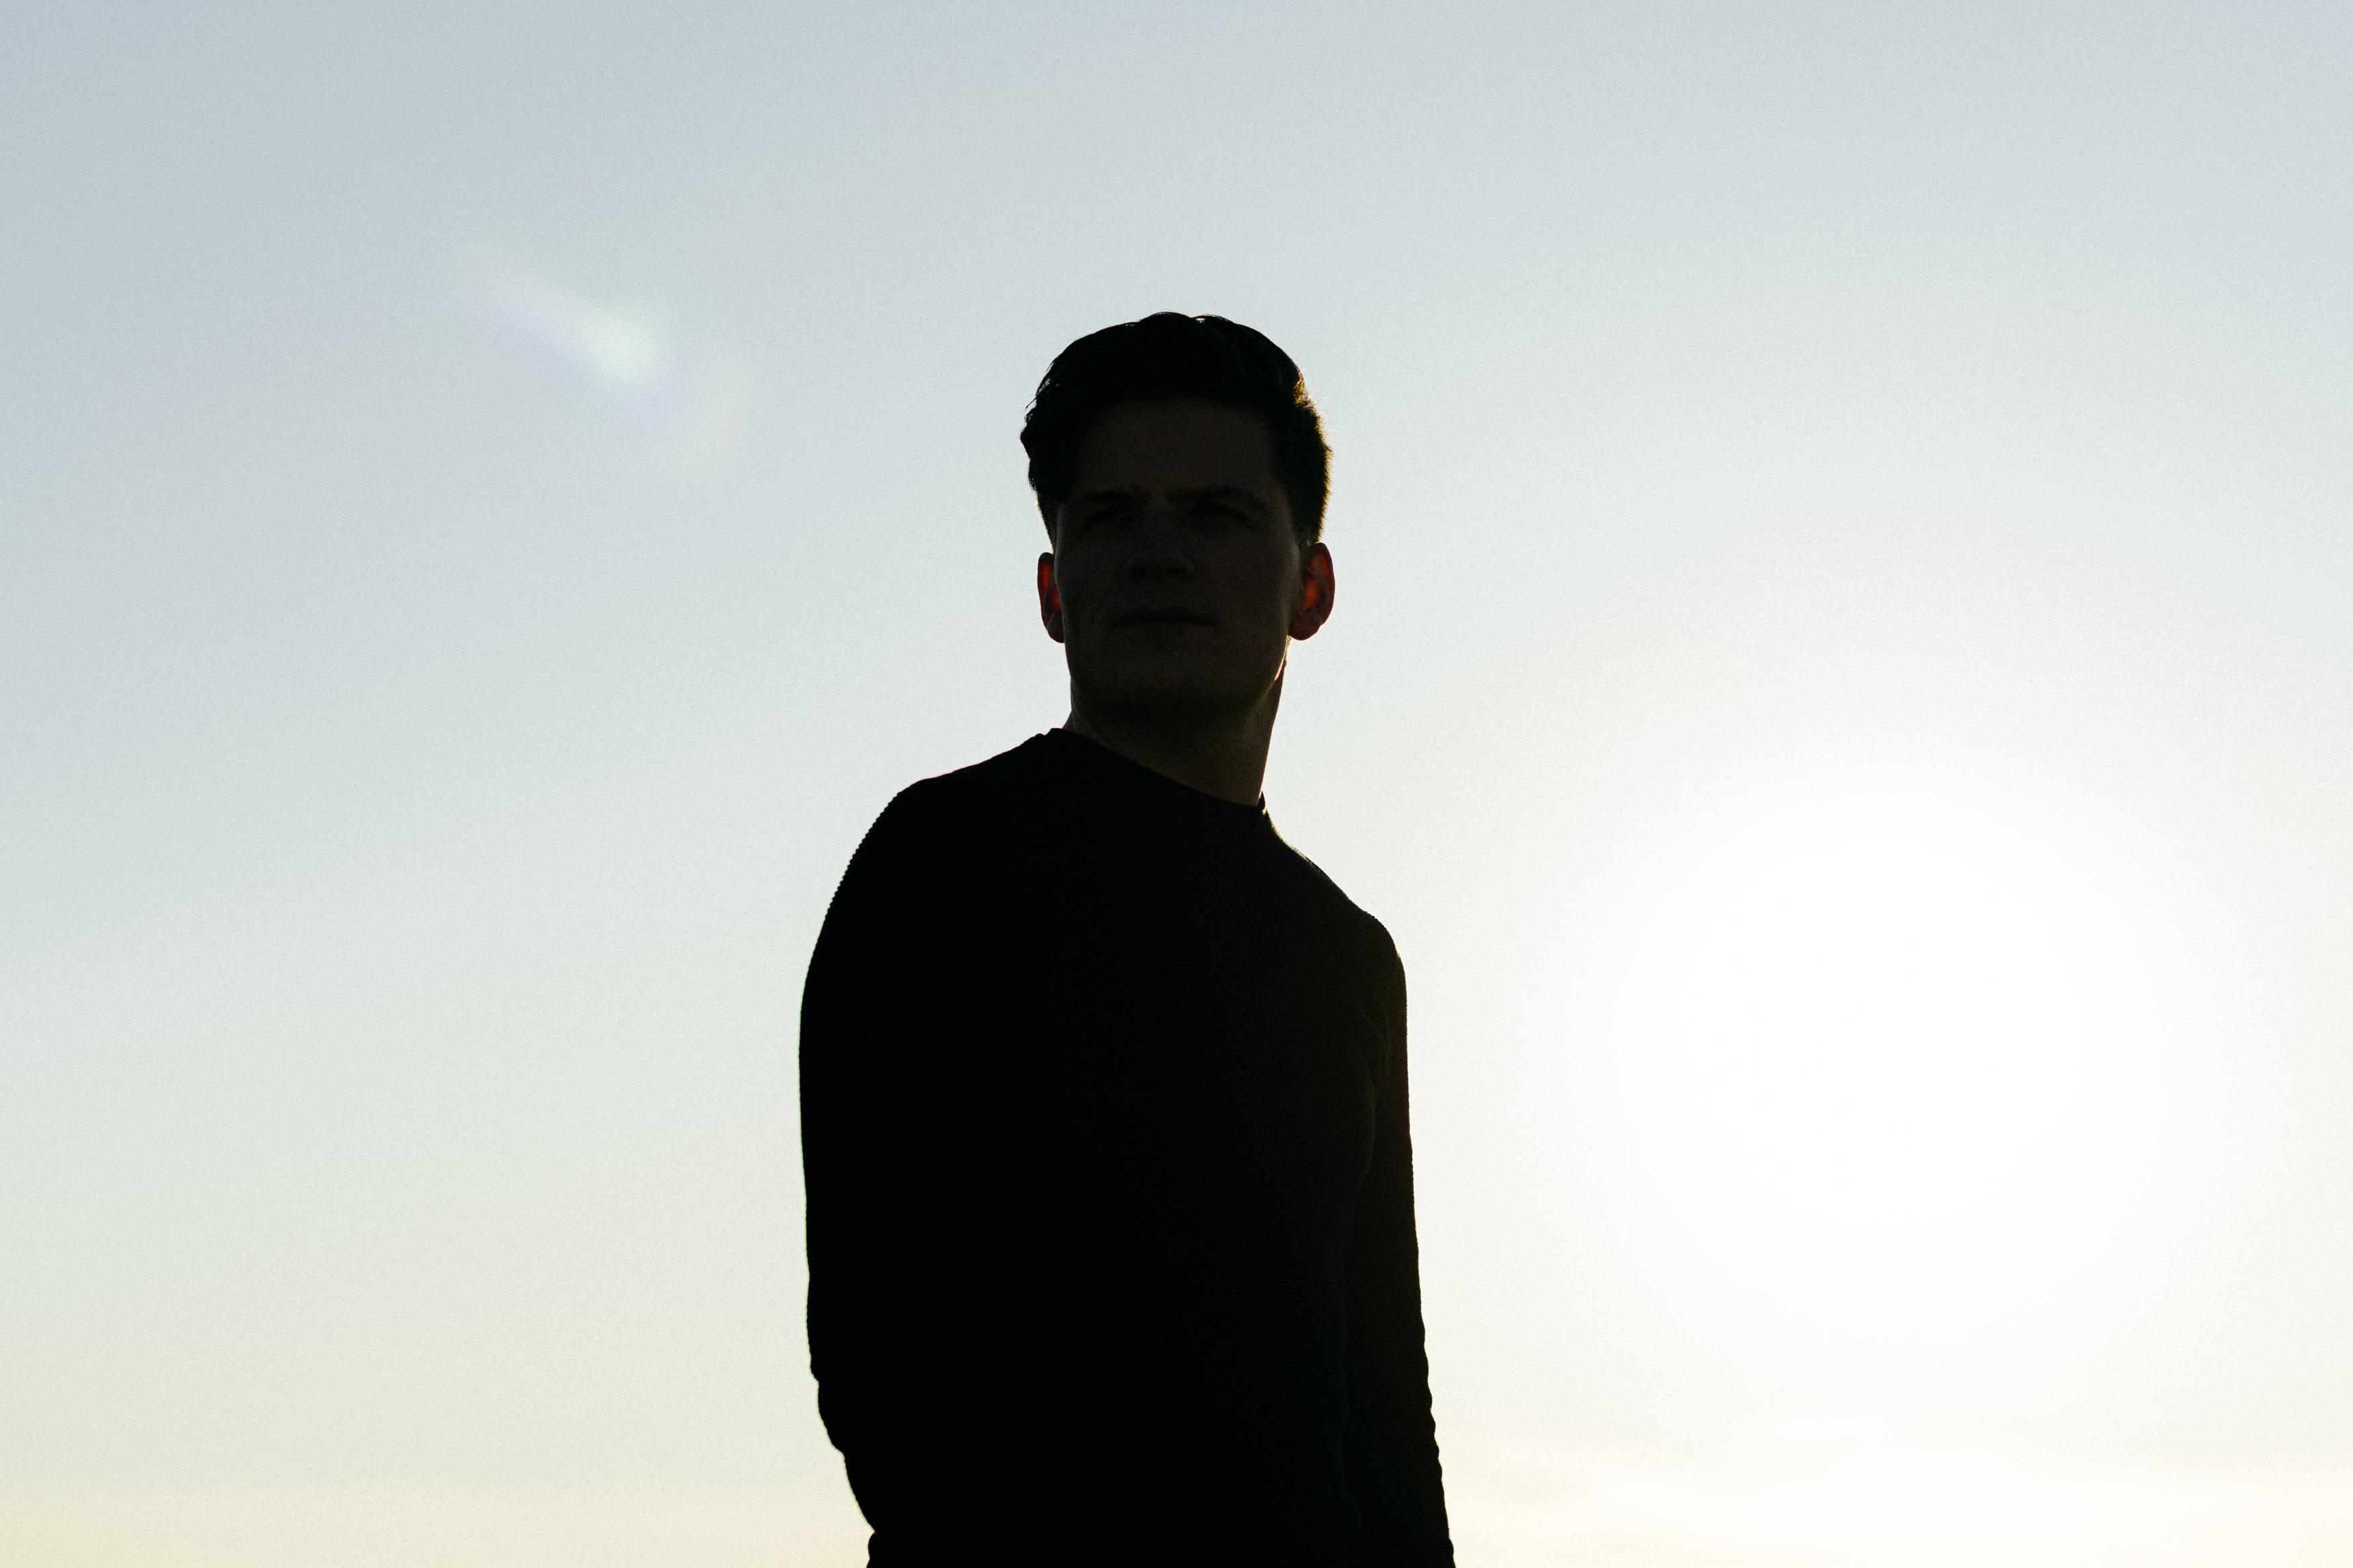 cinematic shadow portrait